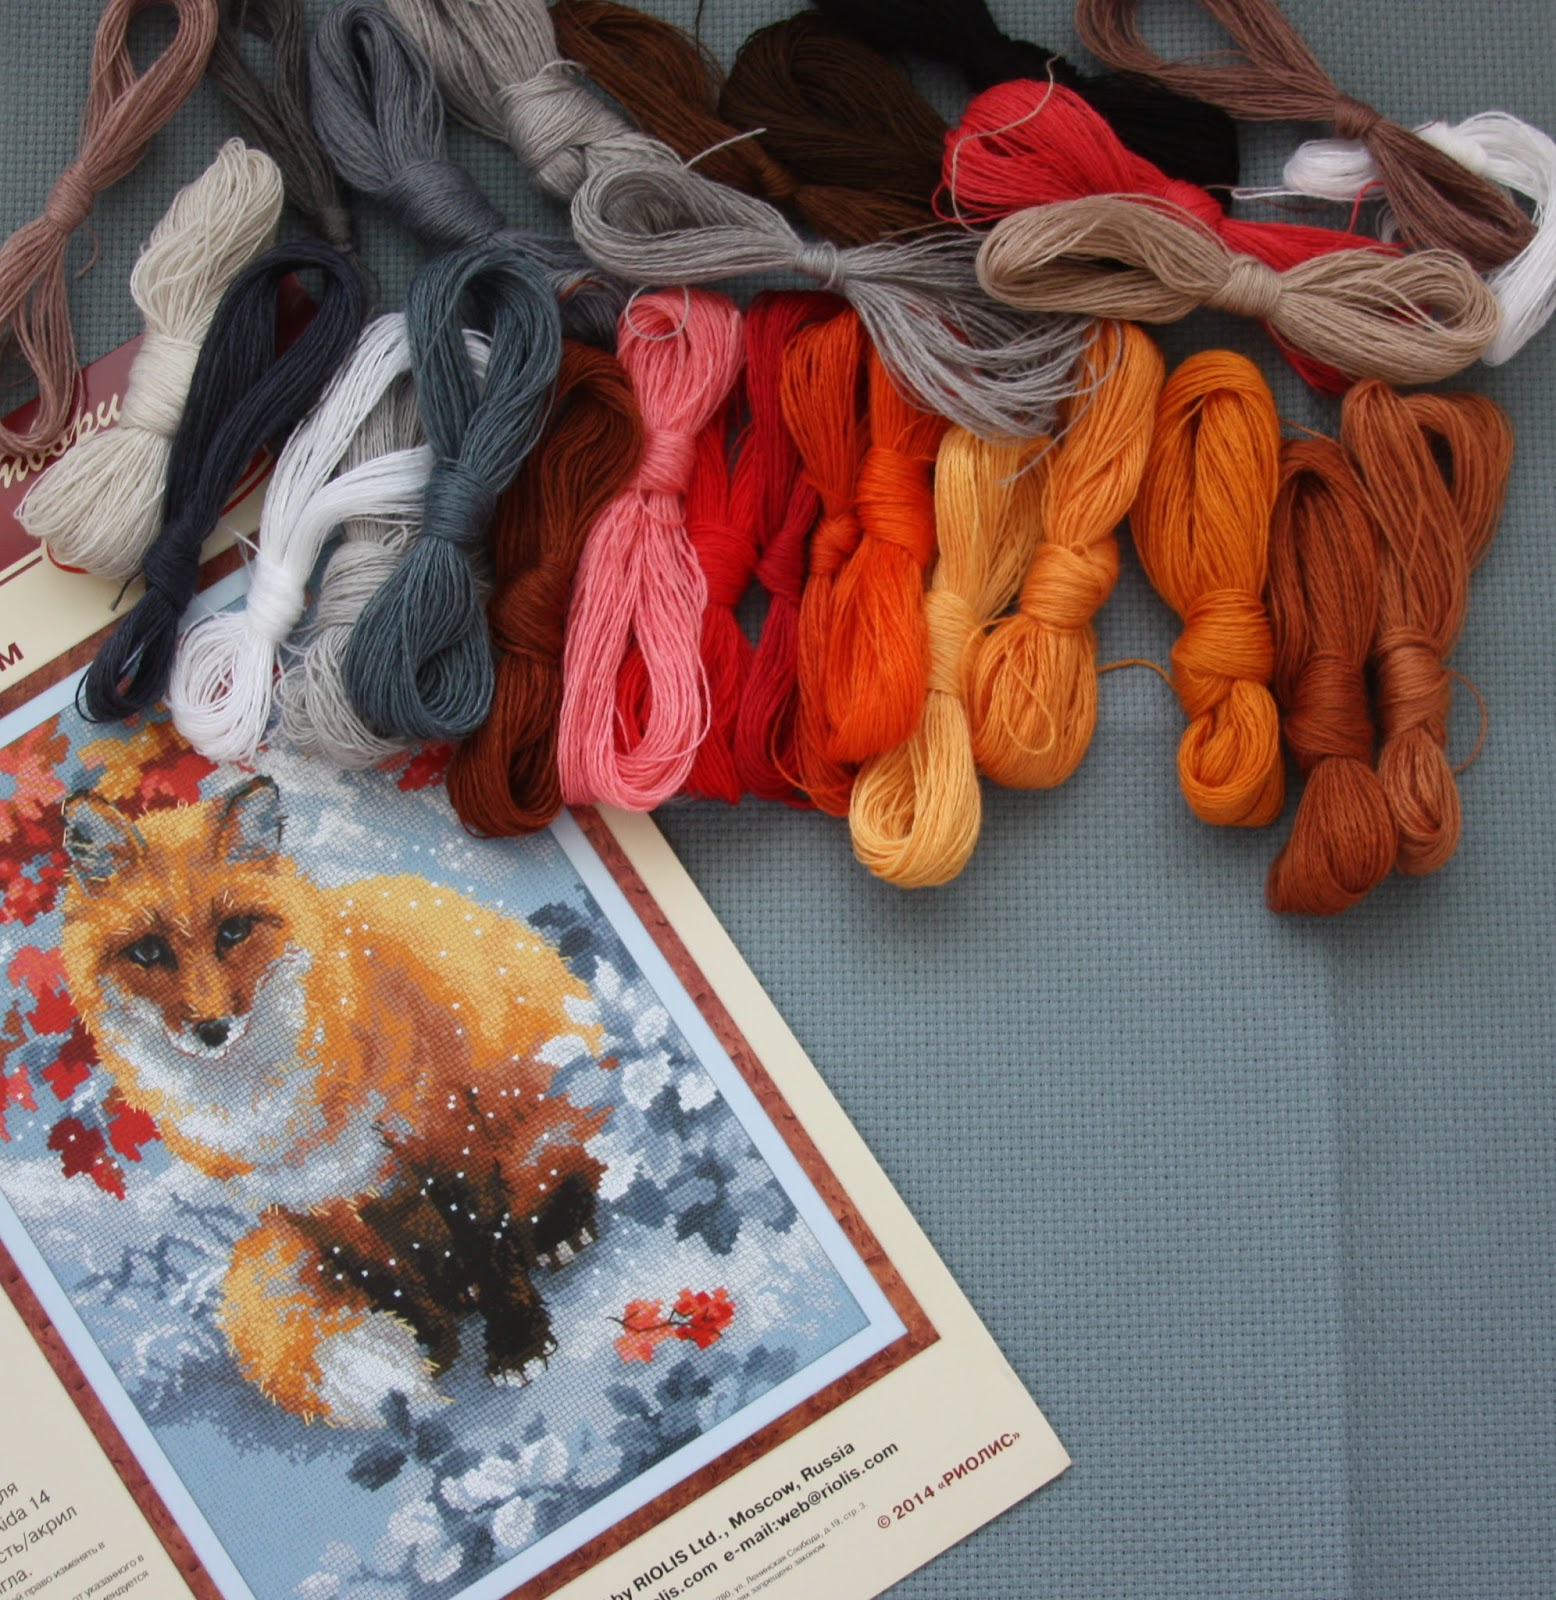 Лисичка вышивка риолис 26